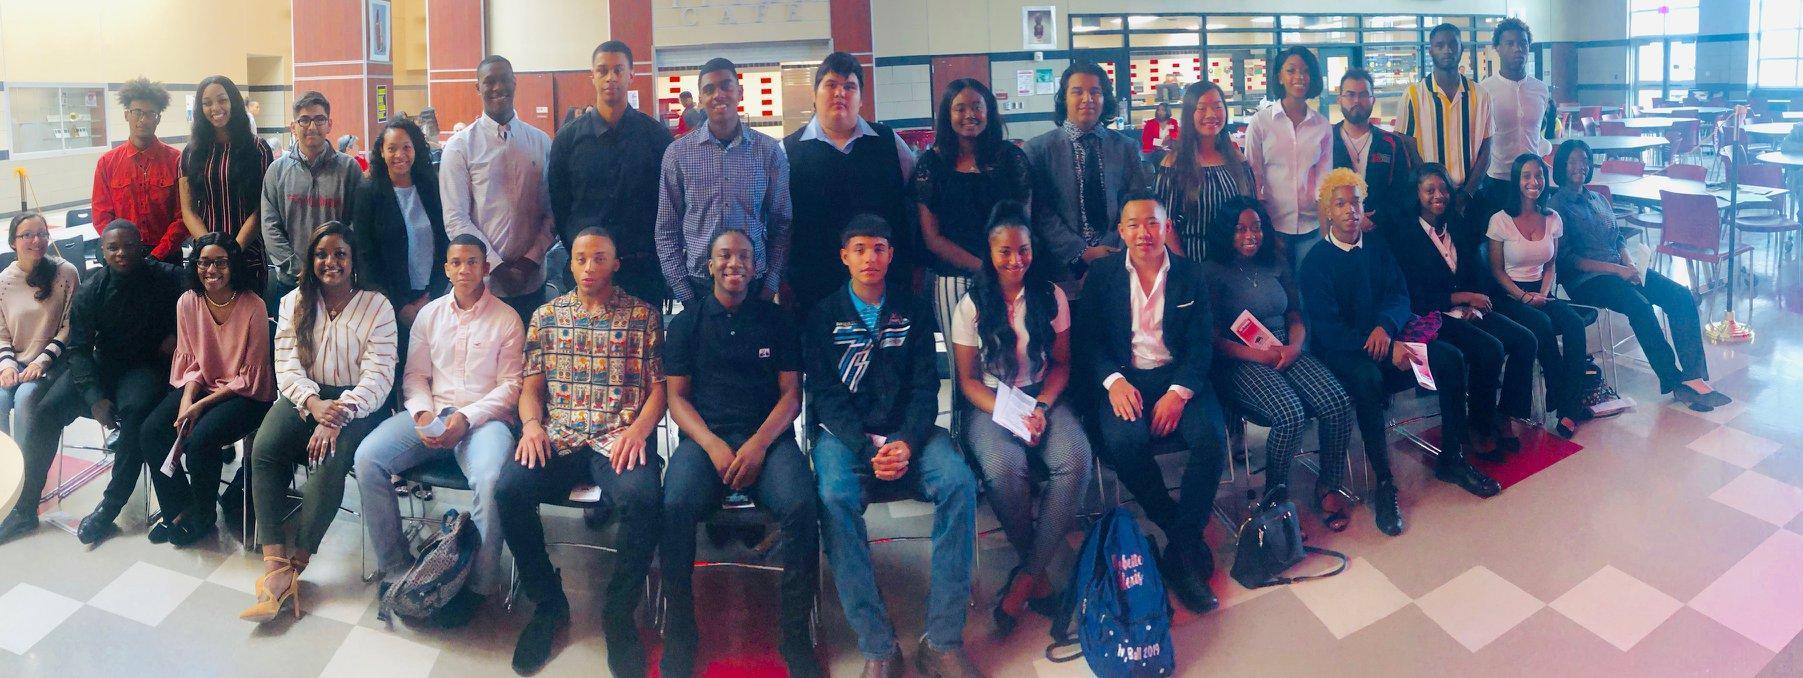 Seniors 2019 Scholarship